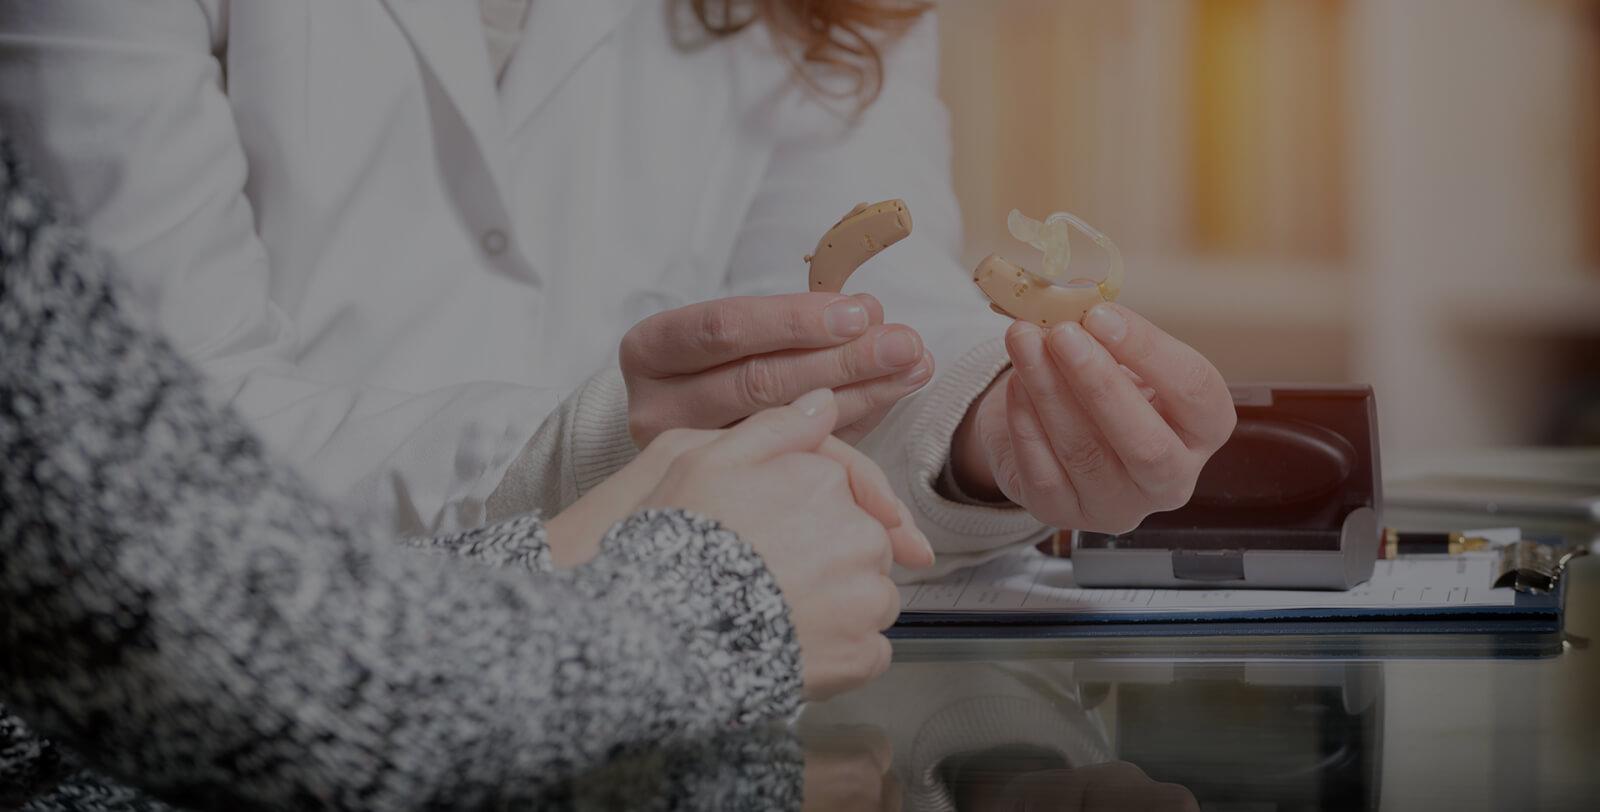 culicchia-neurological-center-cnc-hearing-and-balance-center-hearing-aid-consultation